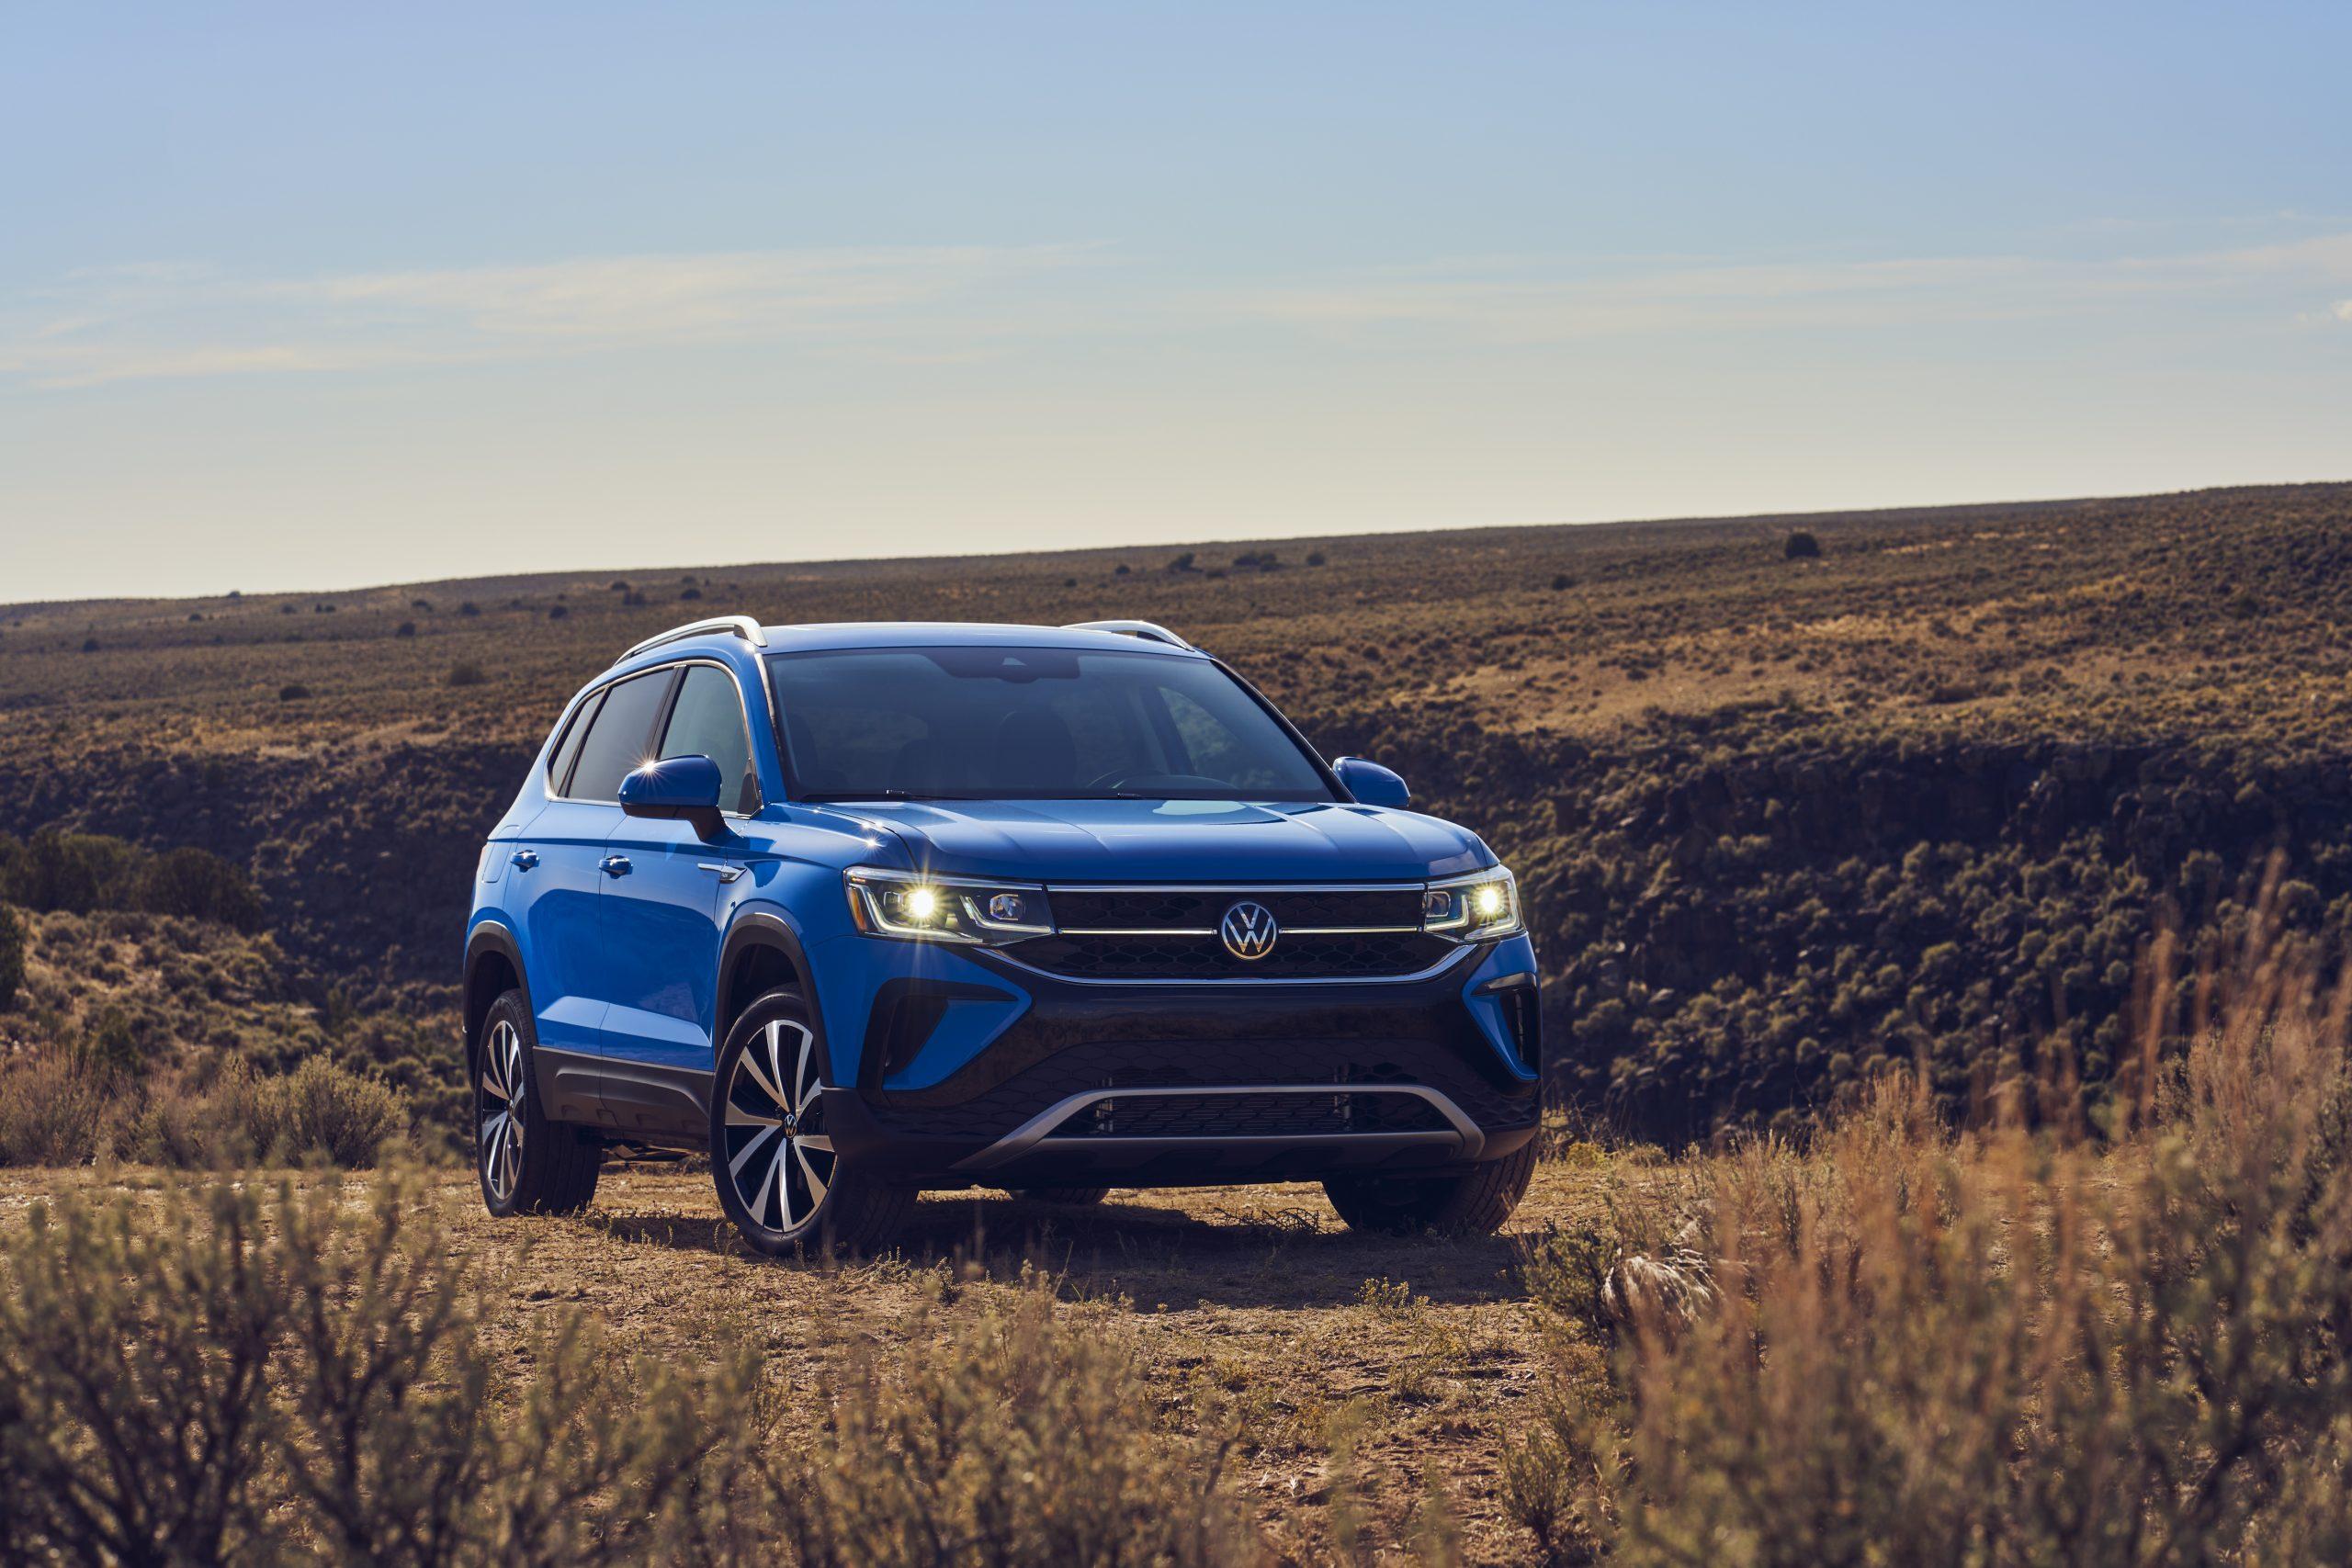 2022 Volkswagen Taos static front three quarter